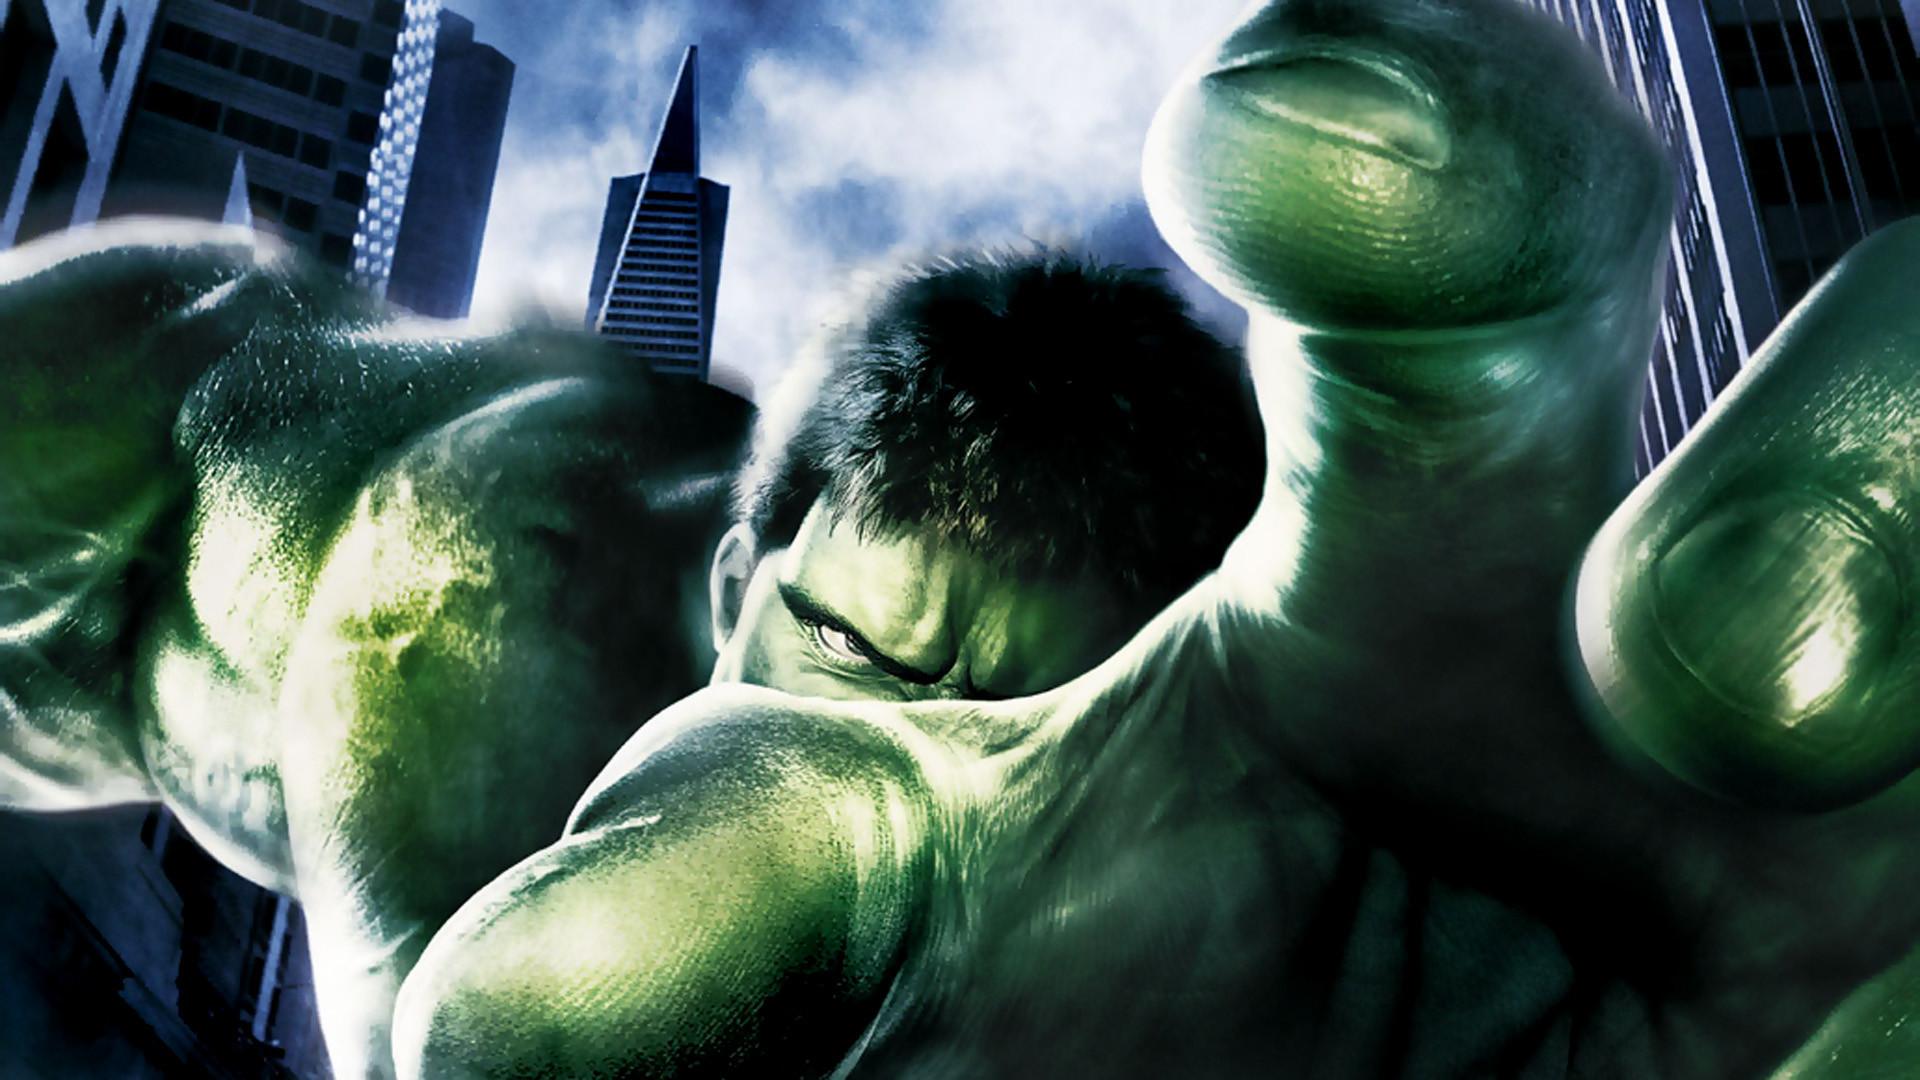 Hulk Movie wallpaper 2018 in Hulk 1920x1080